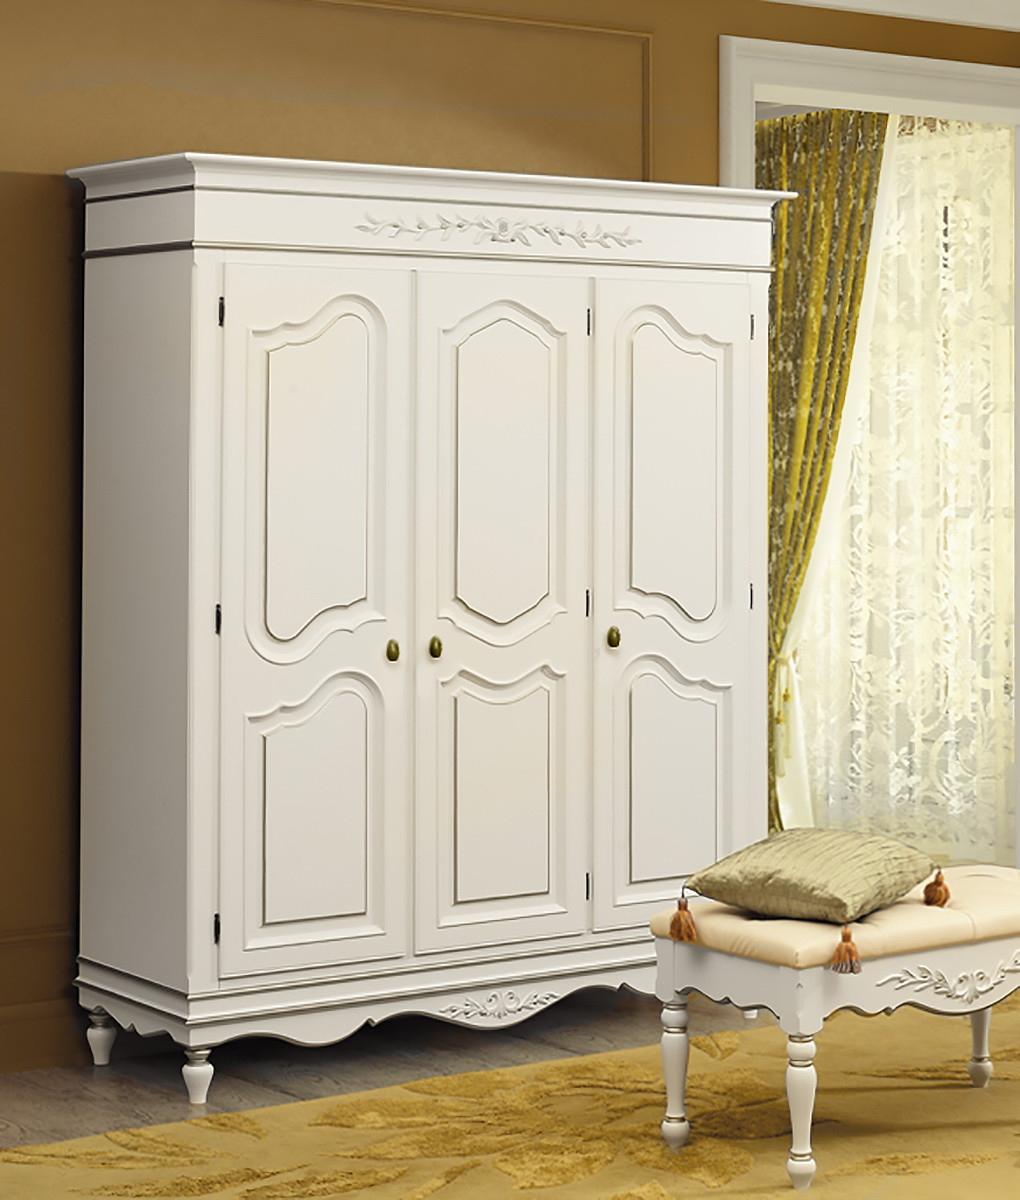 Ln15 шкаф трехстворчатый белый снежный прованс / шкафы / кла.